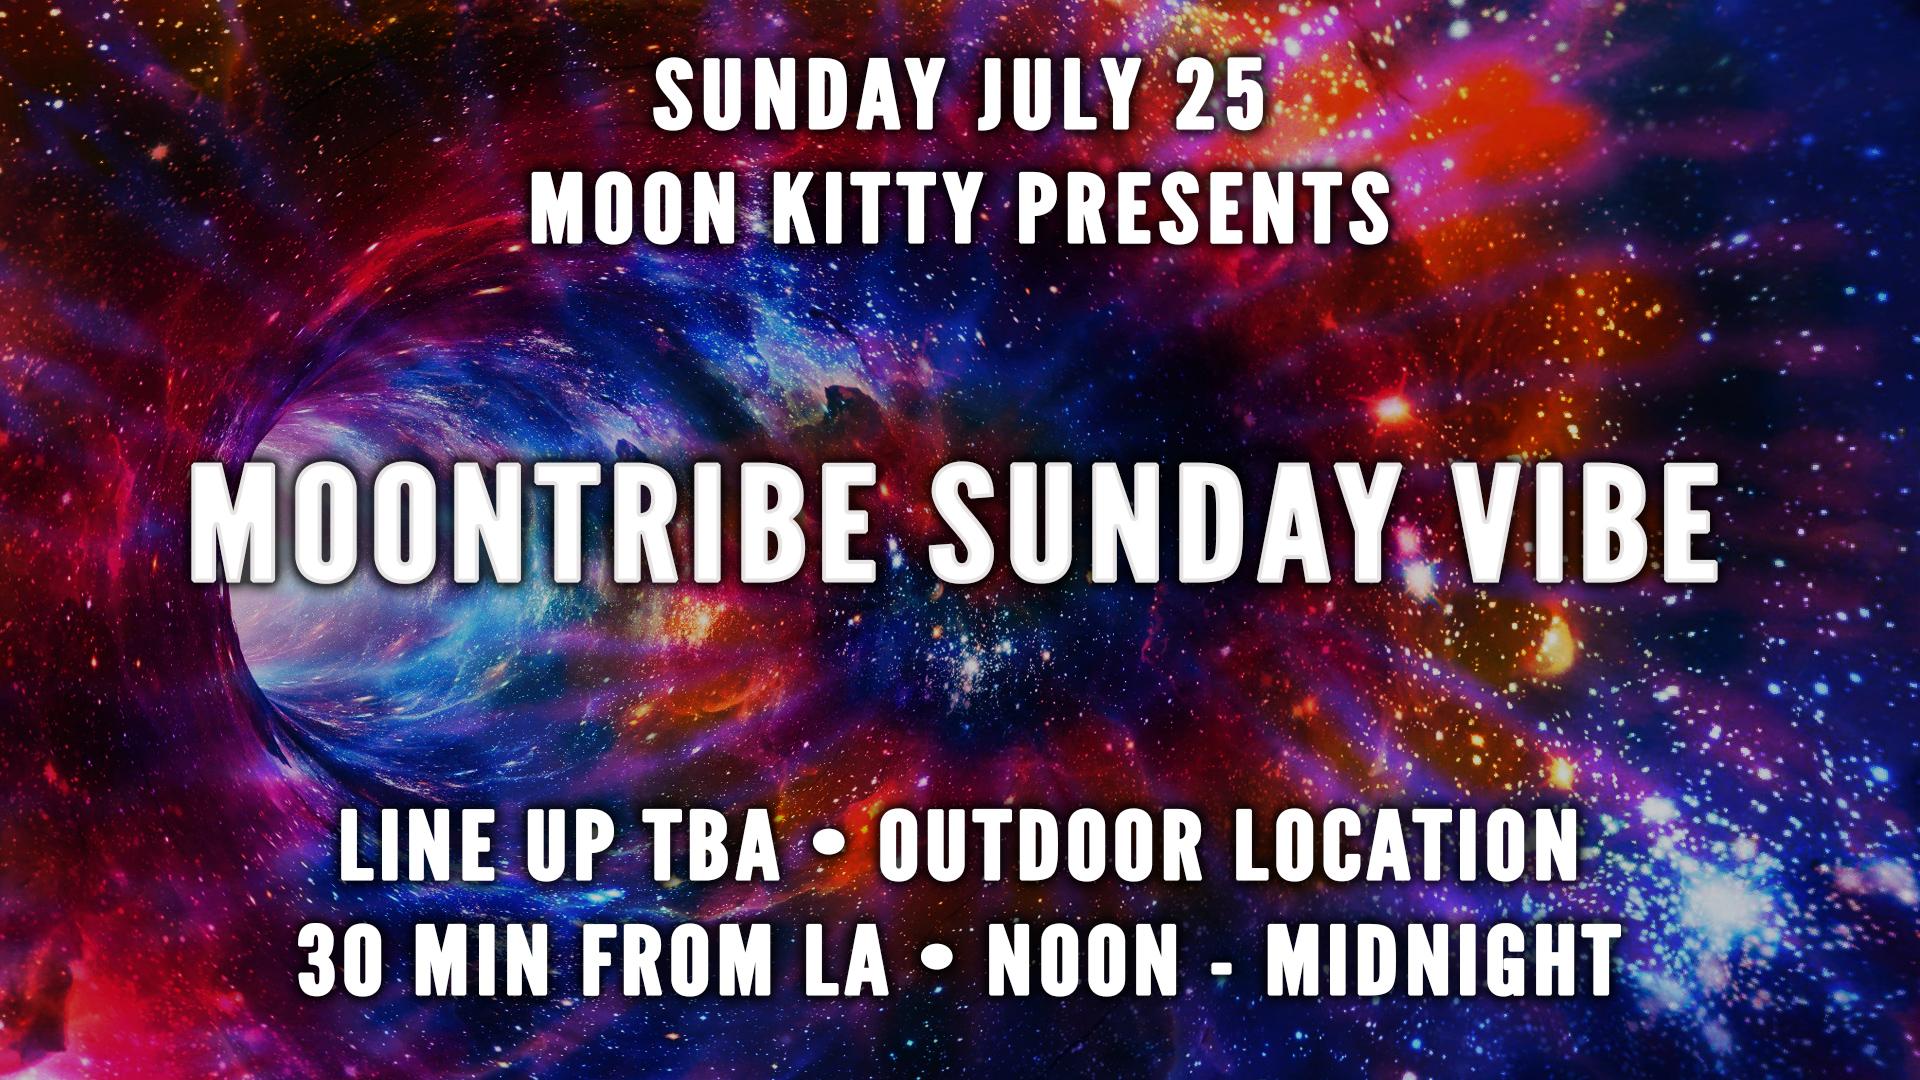 Moon Kitty Presents